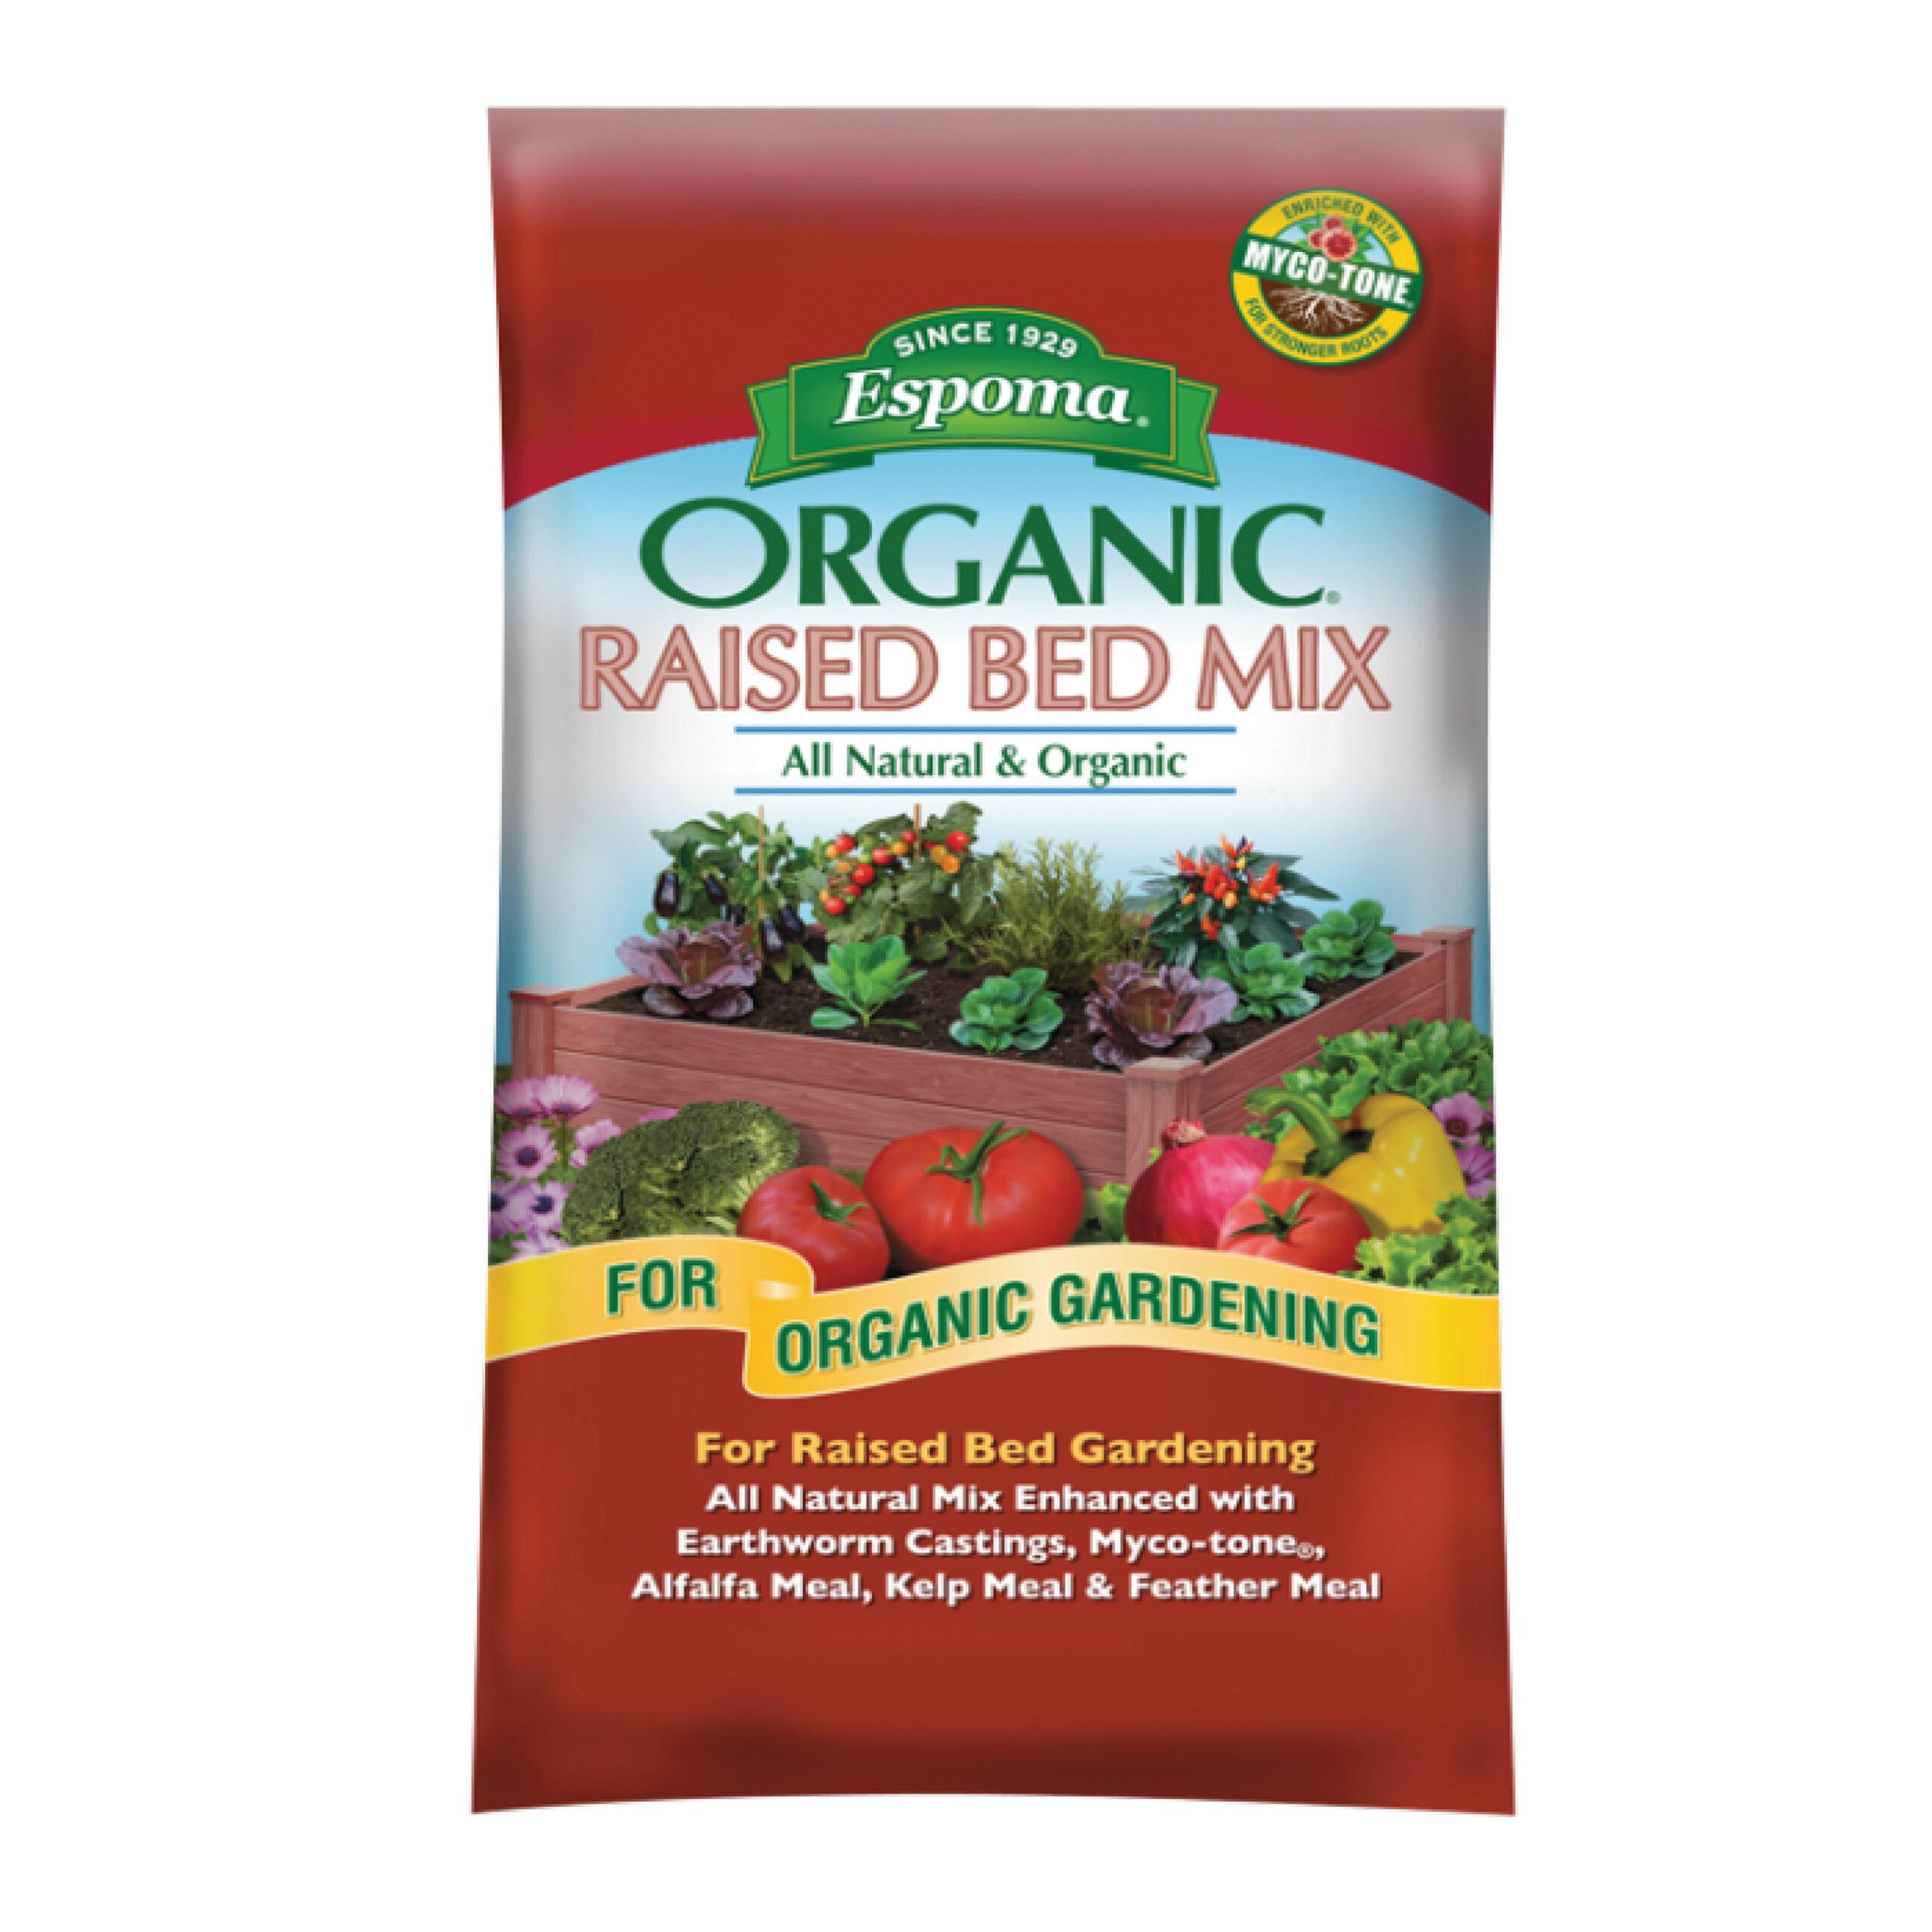 Espoma Organic Raised Bed Mix 104503 1 scaled - English Gardens Orchard Lake Road West Bloomfield Township Mi